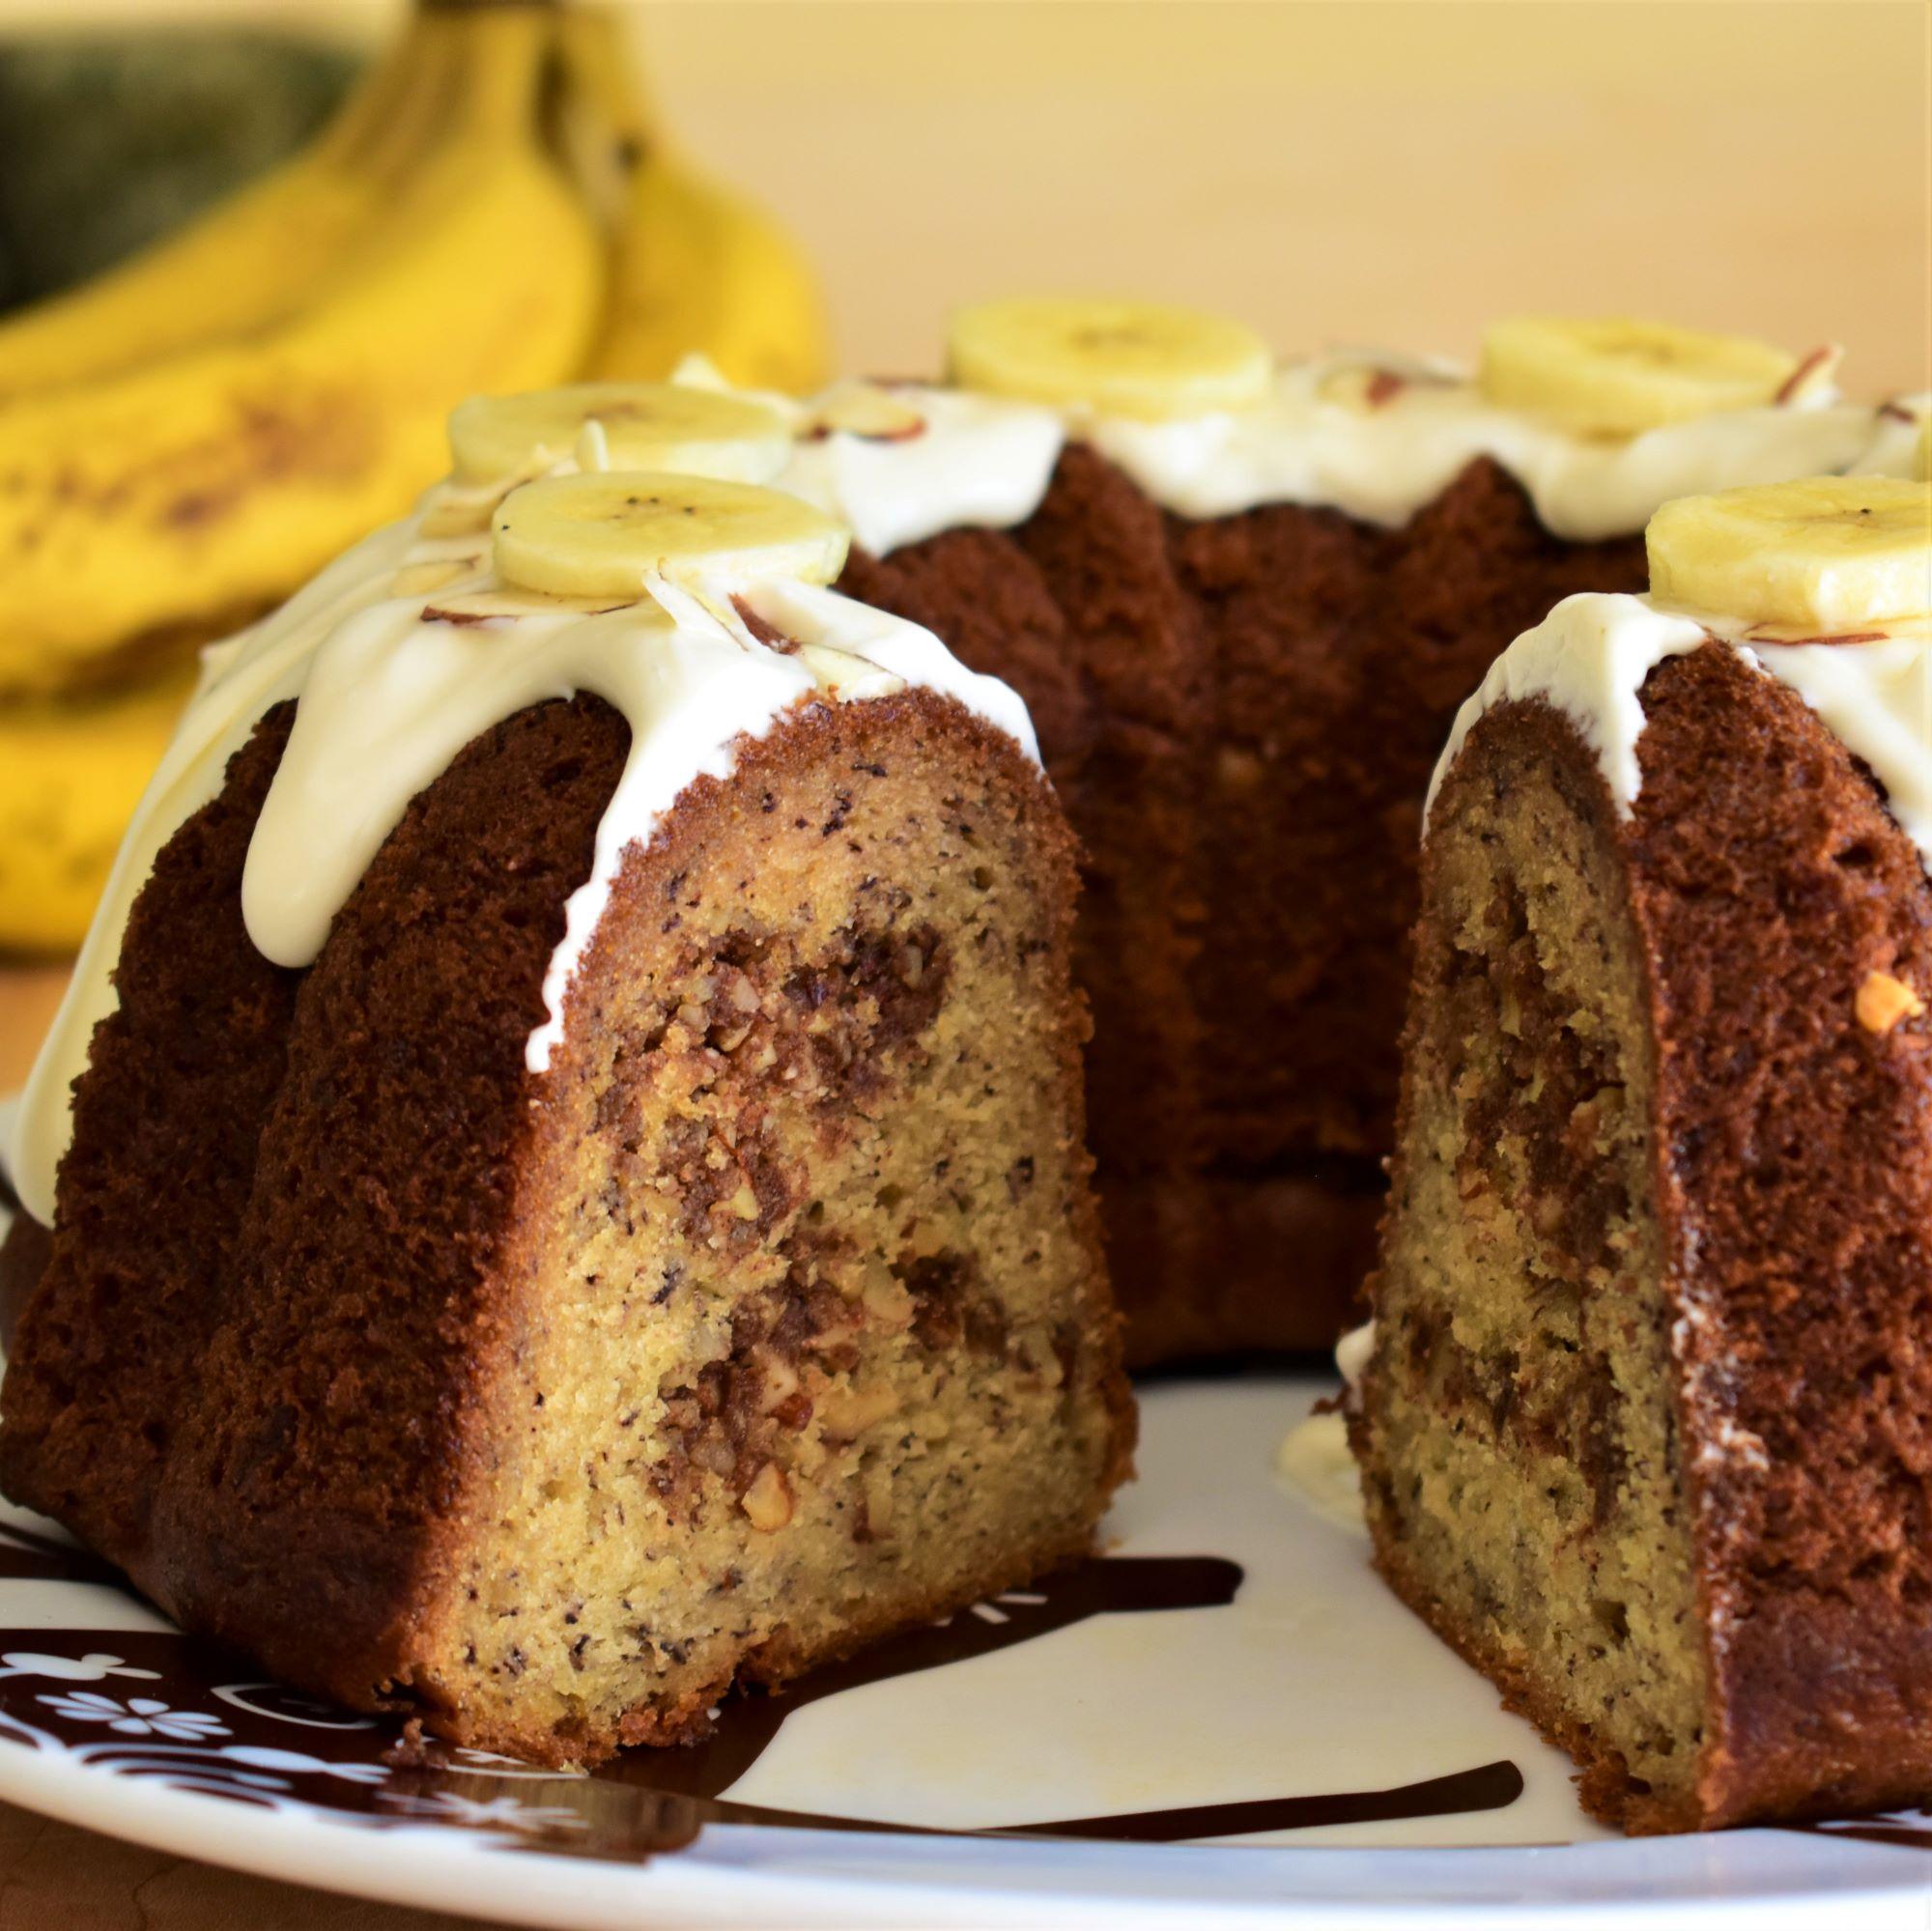 Banana-Almond Streusel Bundt® Cake